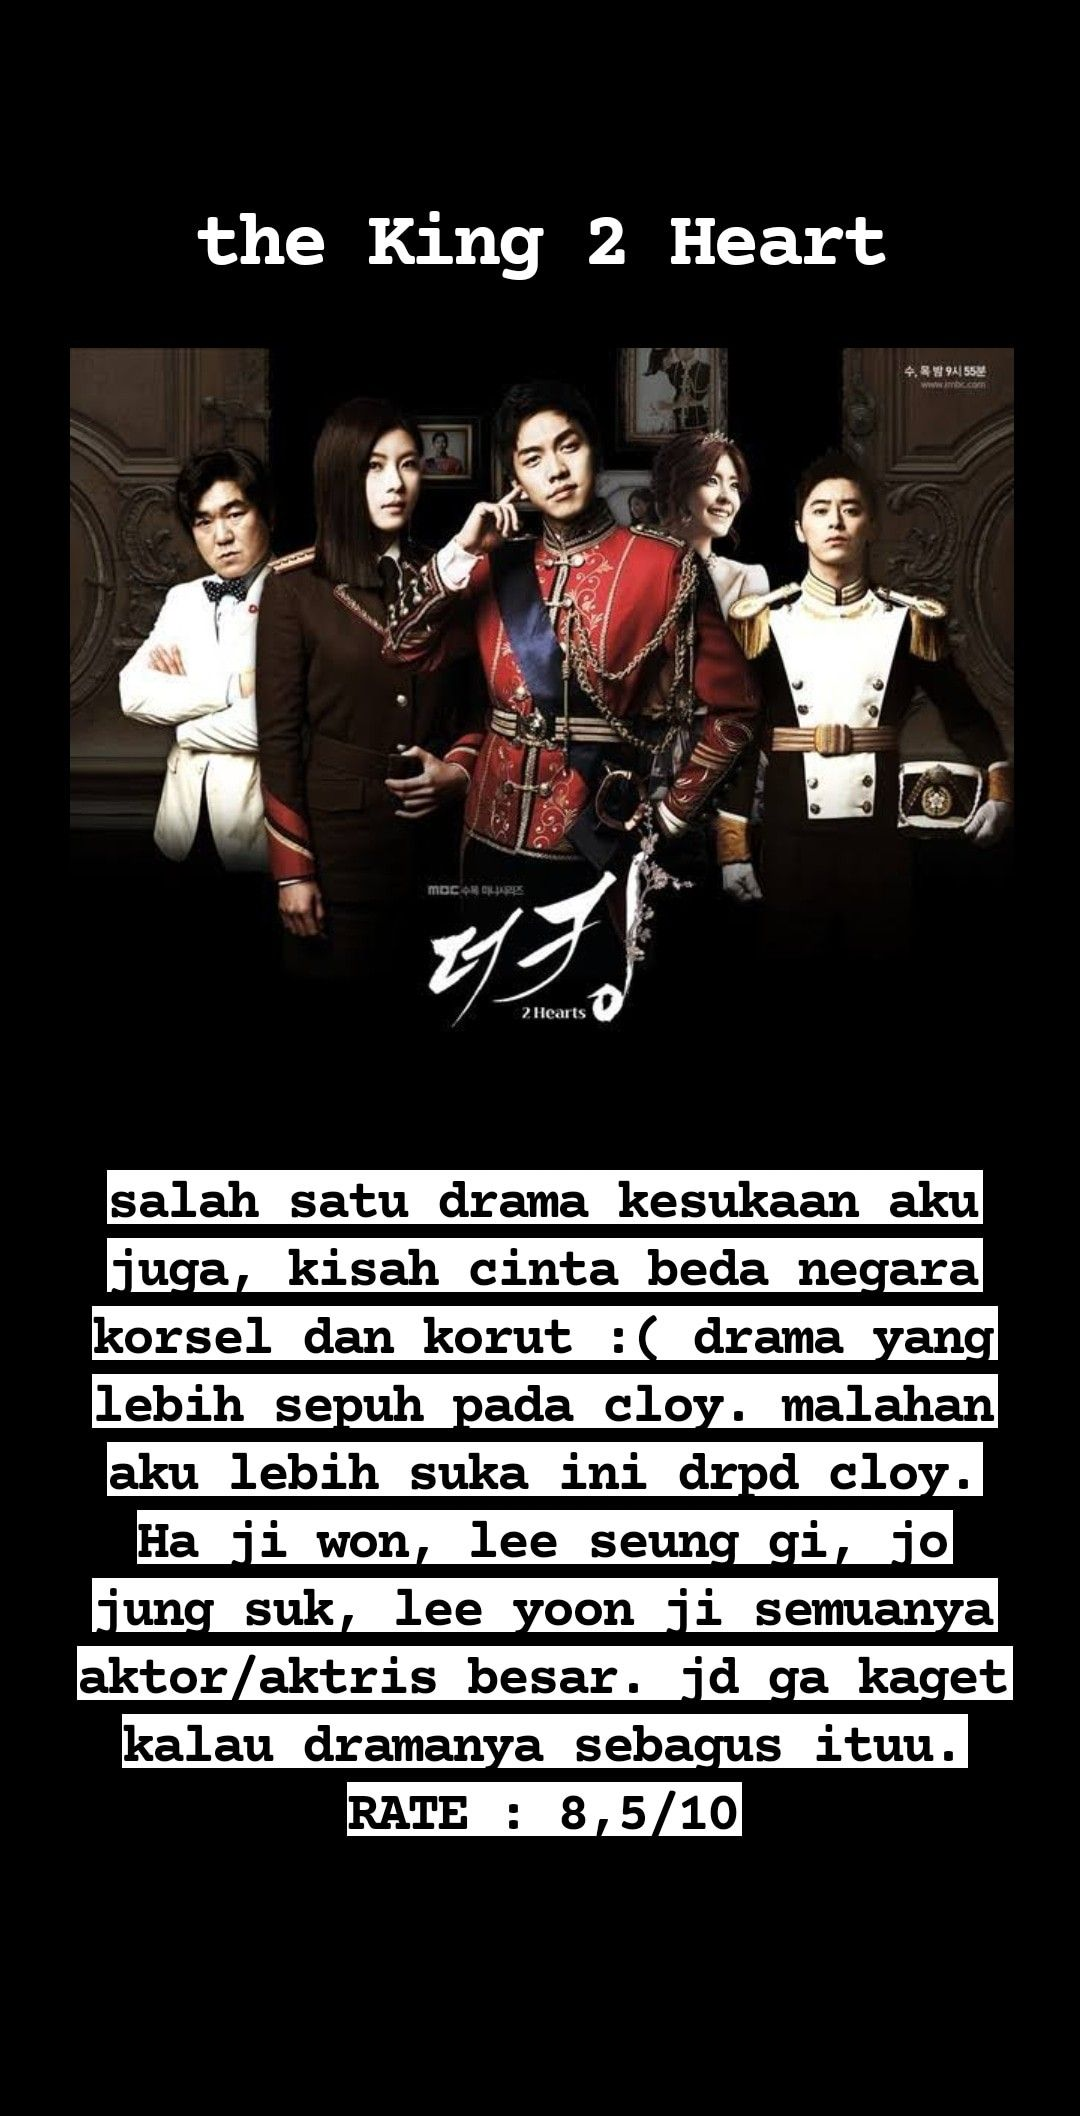 The King 2 Heart Aktor Aktris